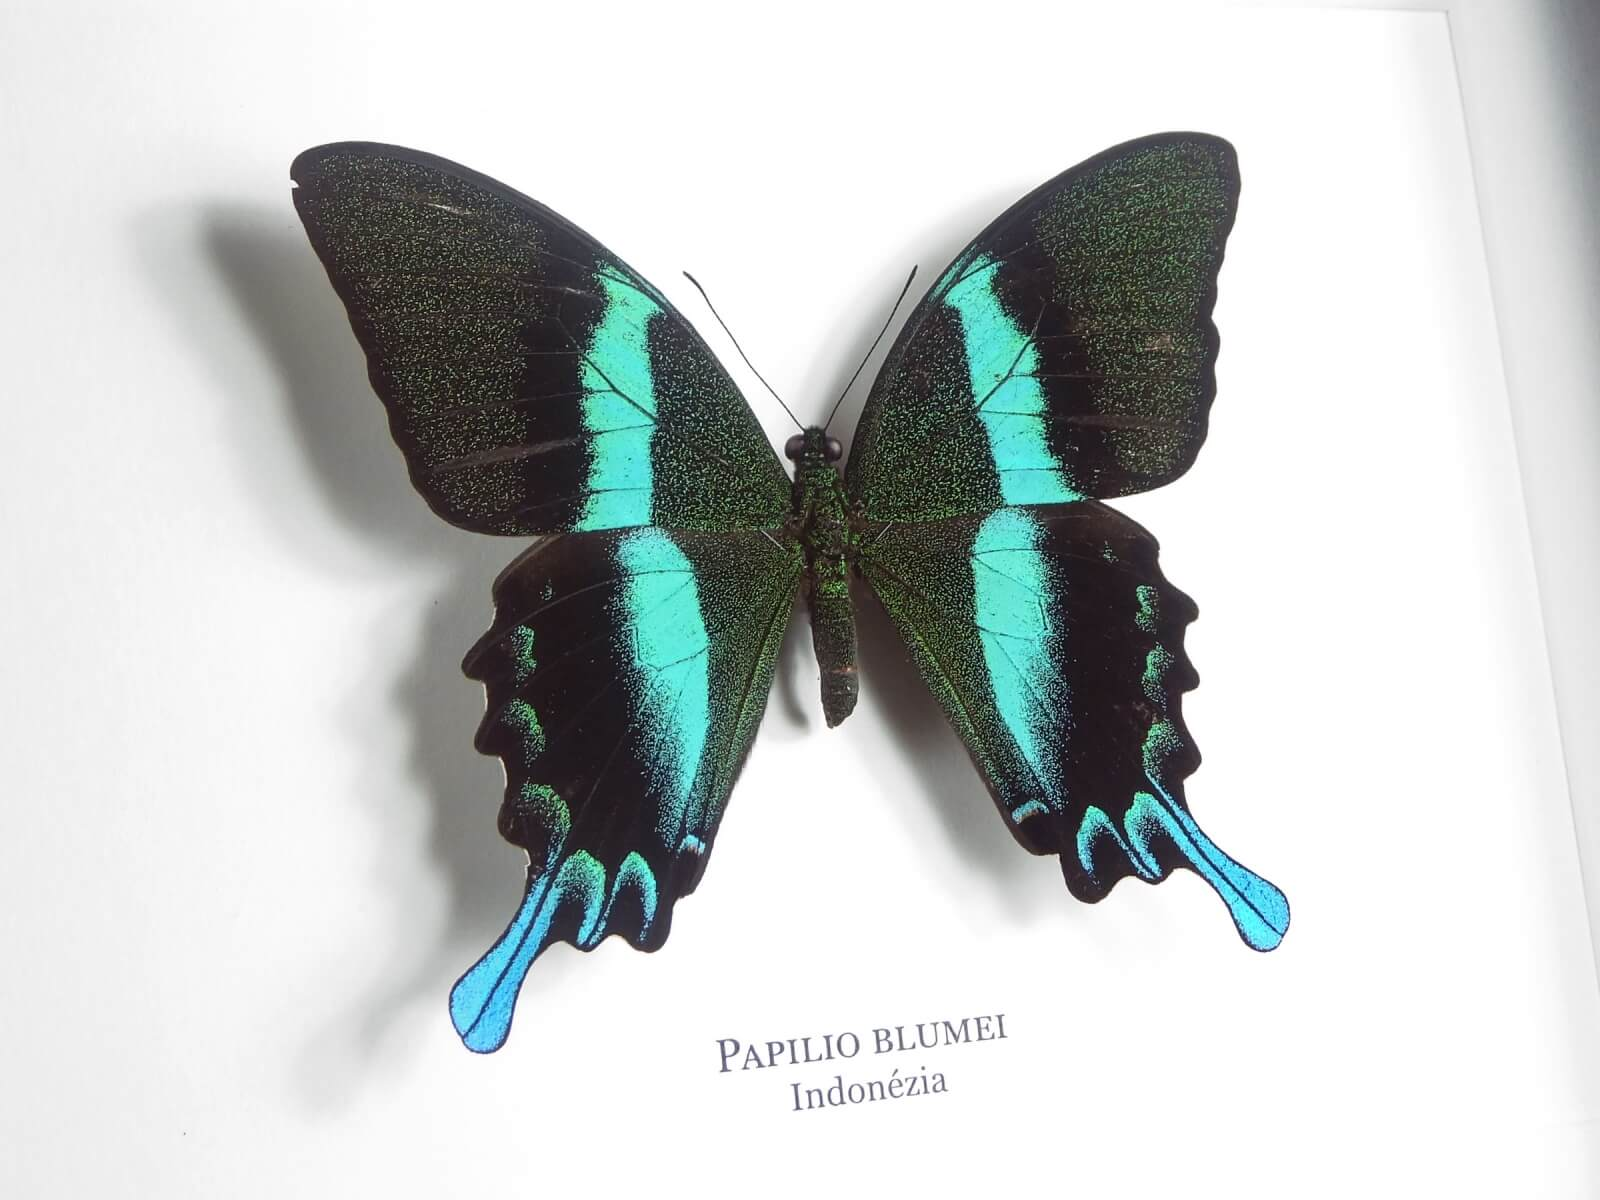 Papilio blumei, fekete keretben | #1937